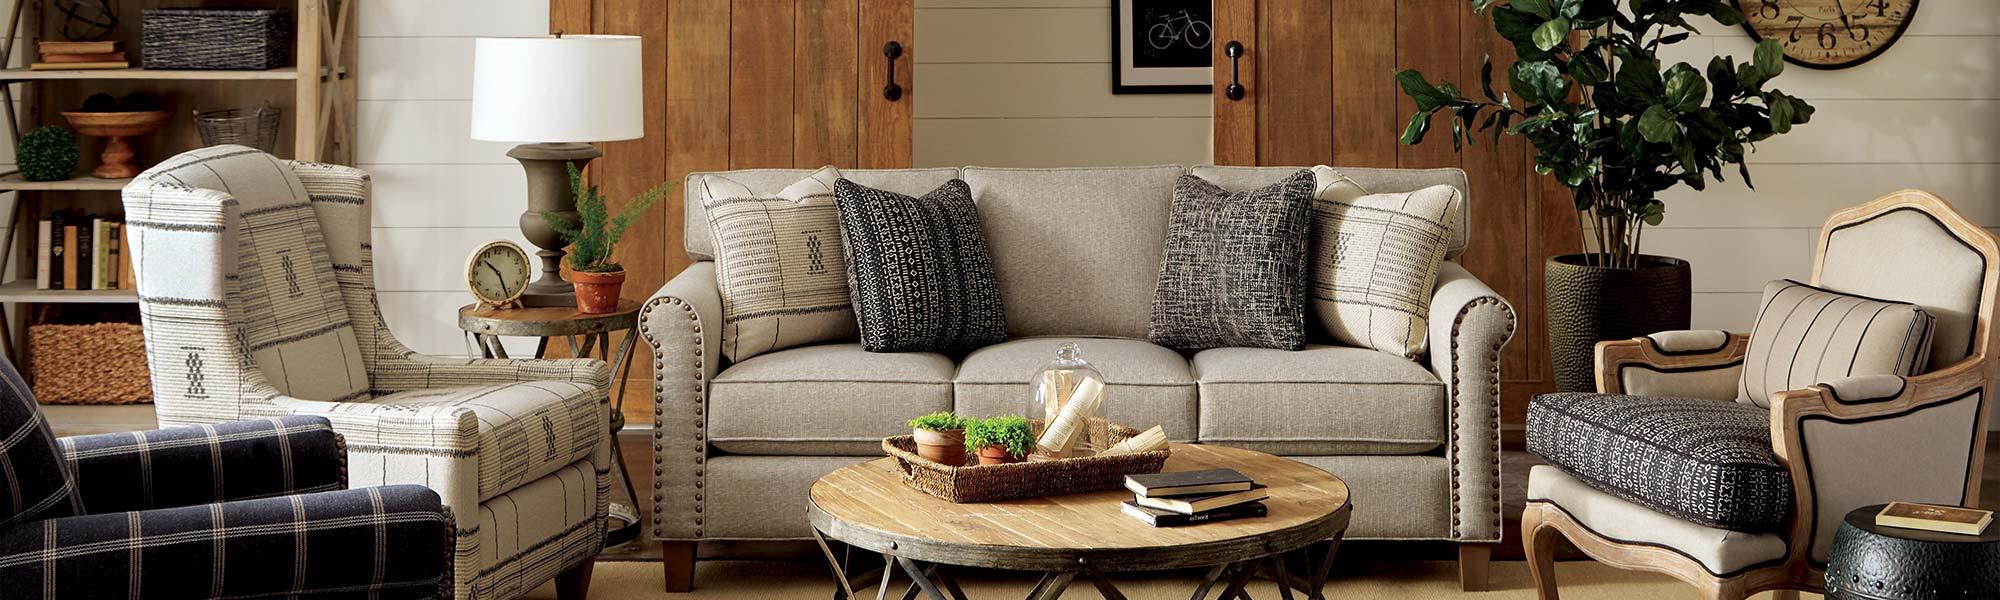 Home Furniture Store In Warner Robins Ga Phillips Furniture